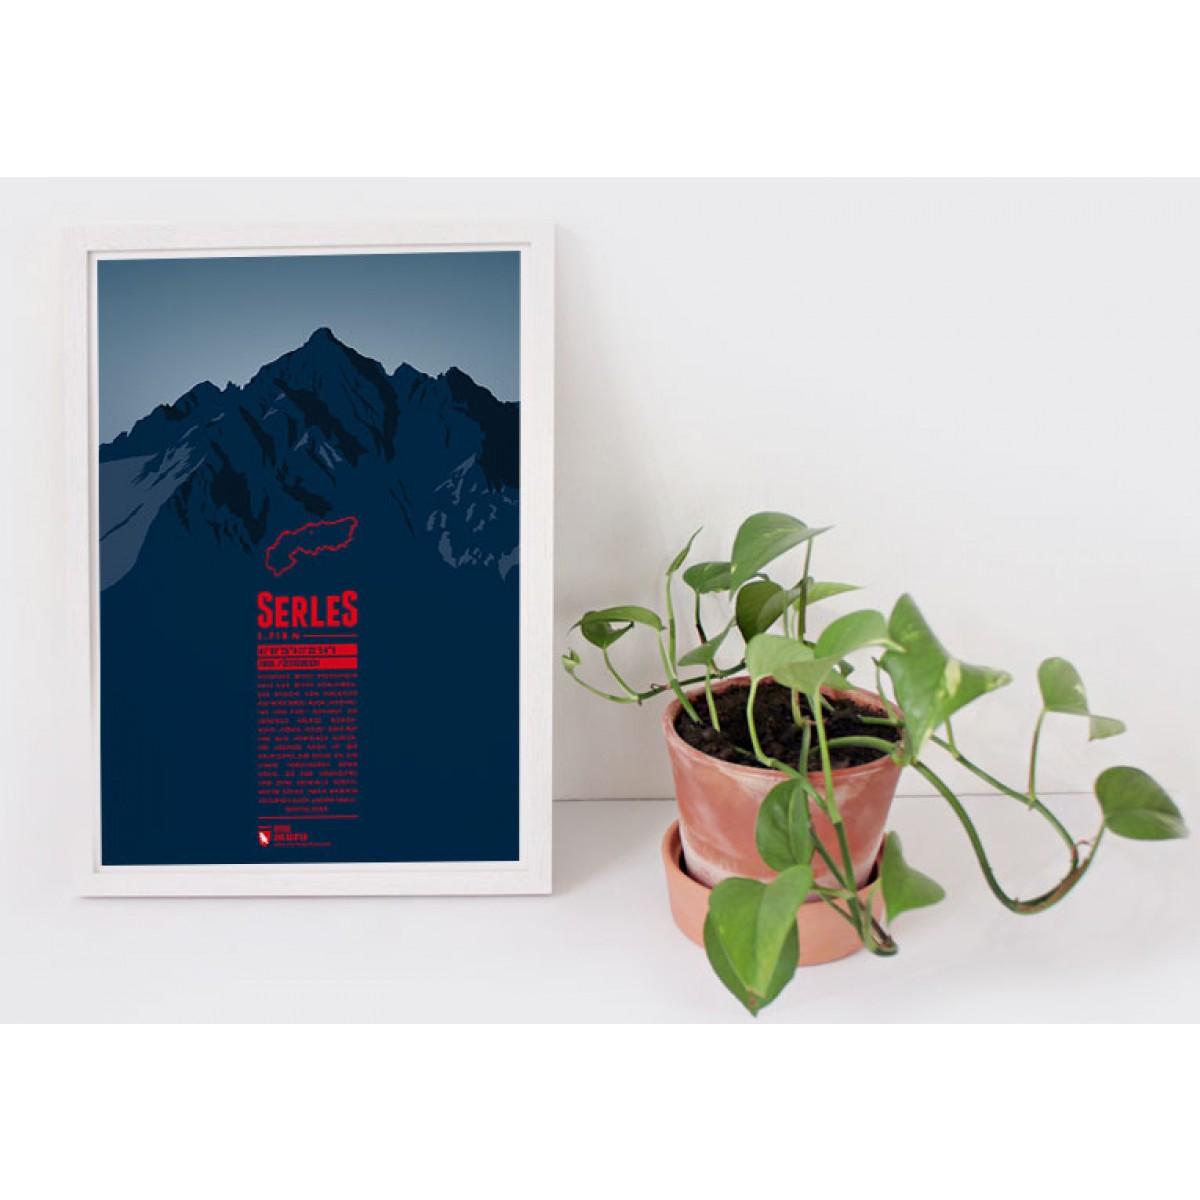 Serles - Bergdruck